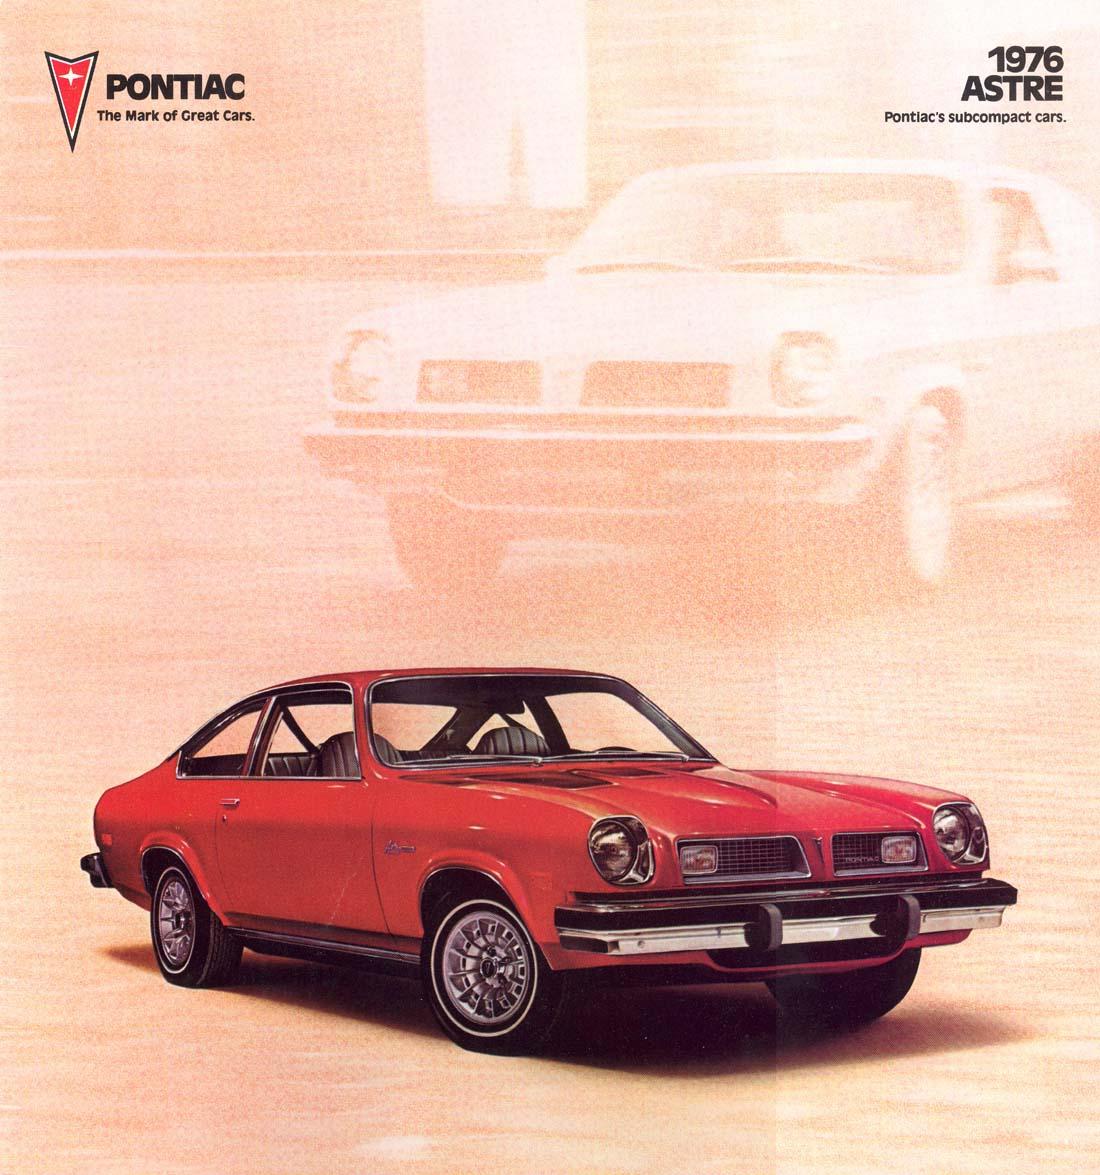 1976 Astre 1